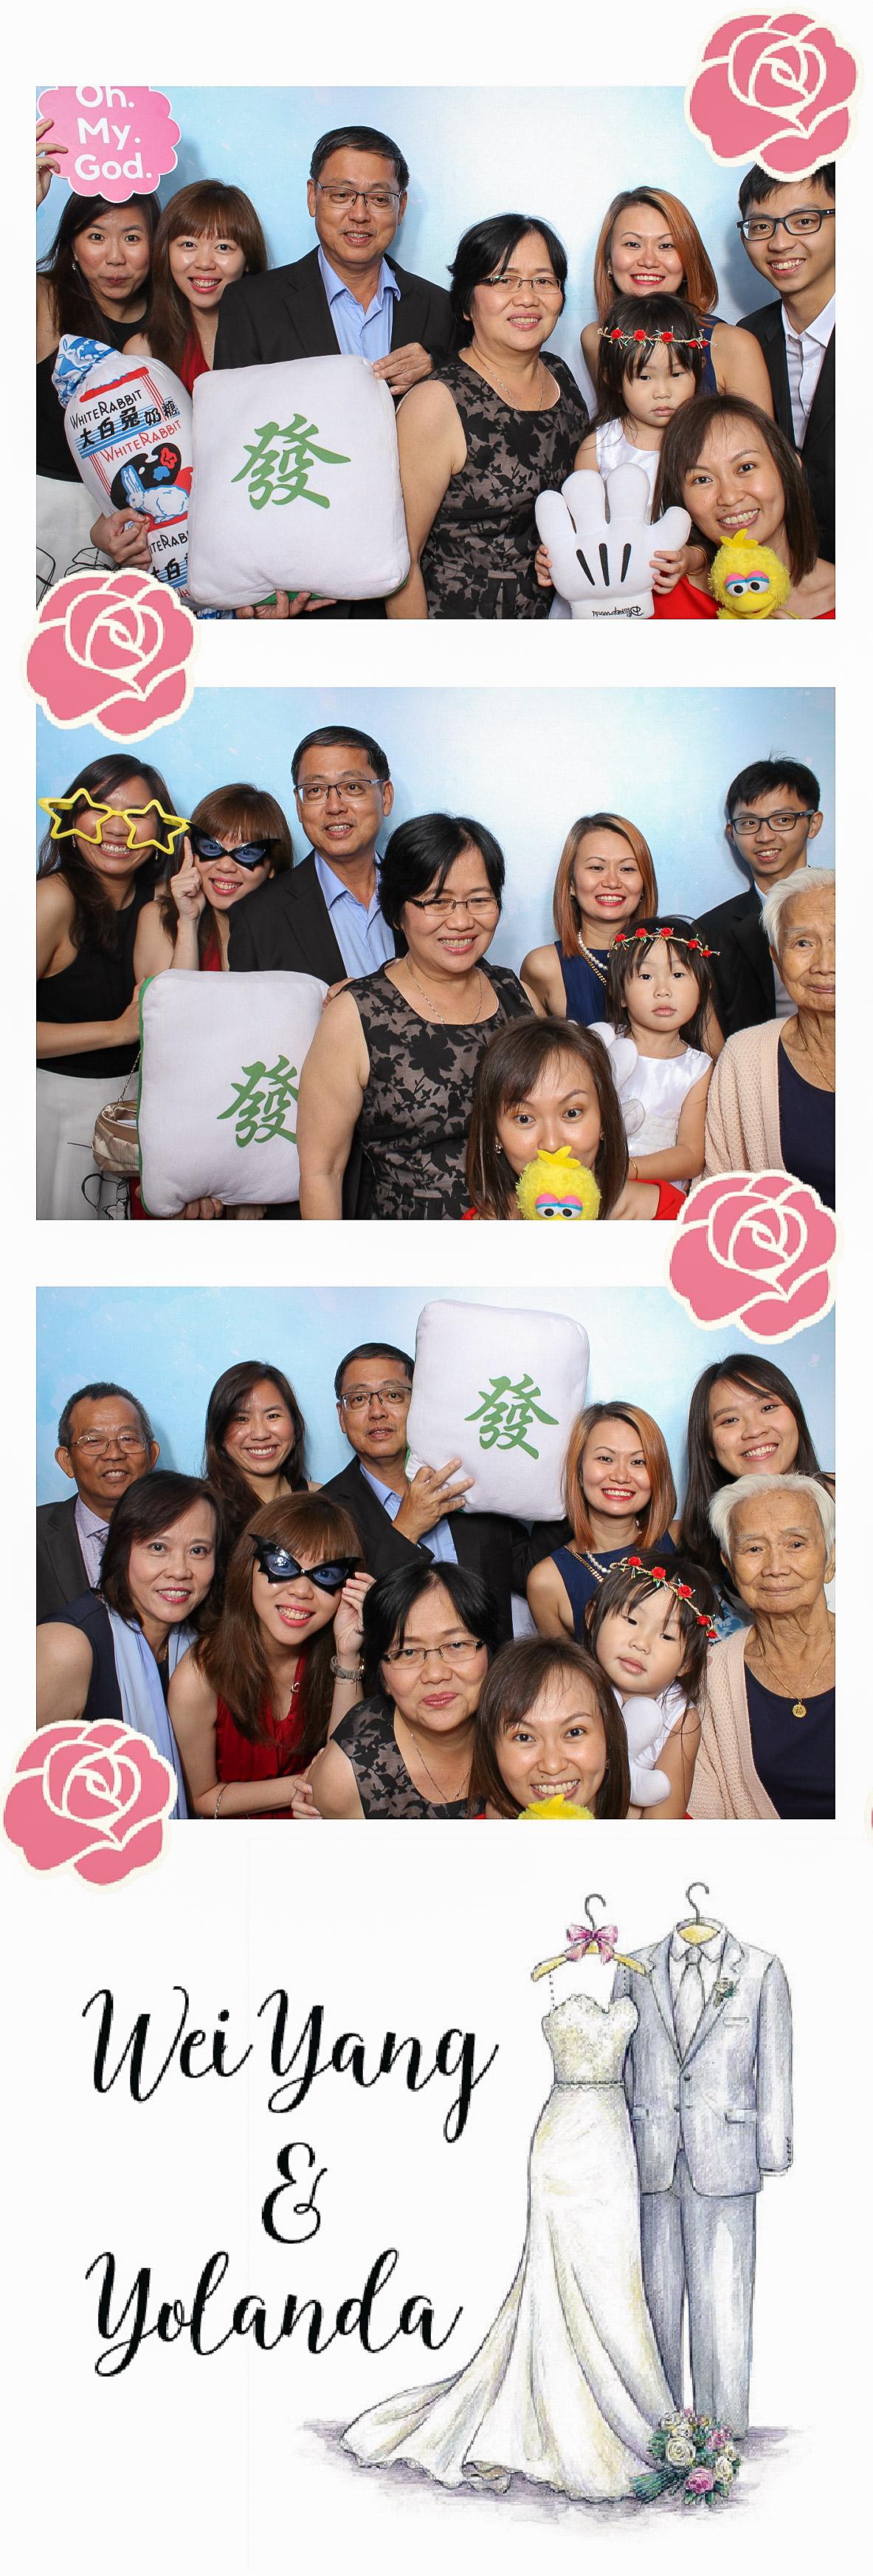 Photobooth 1706-51